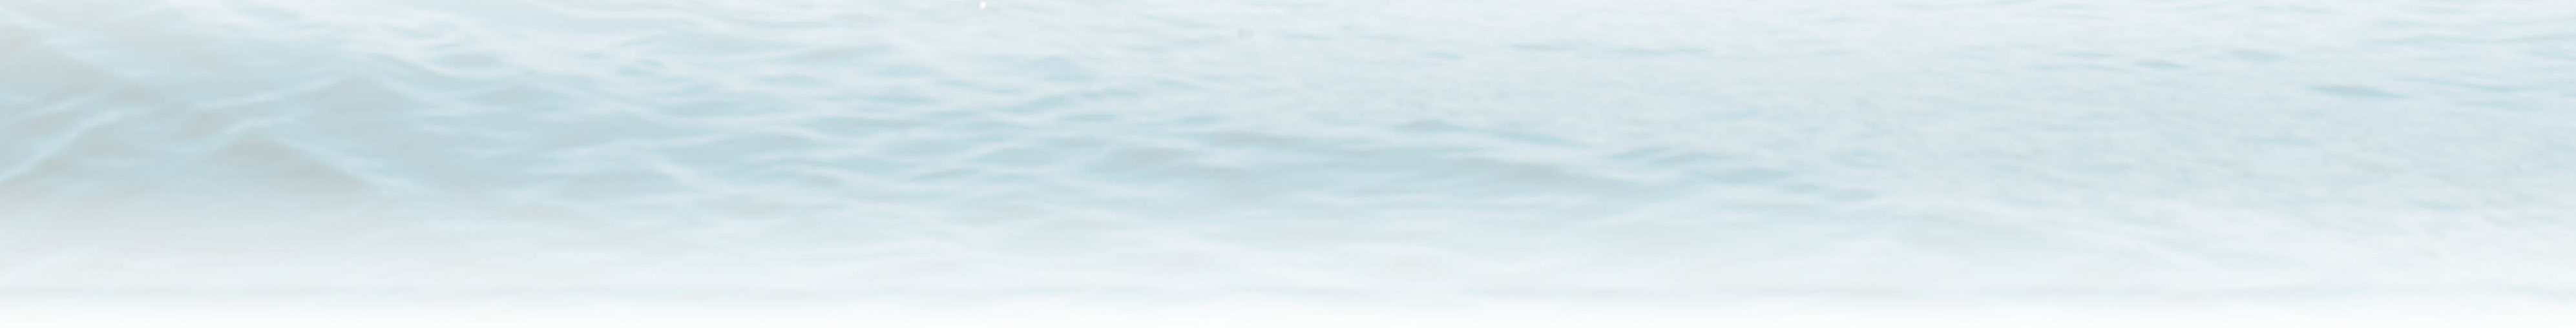 Chesapeake Bay Water Ripple | Header fade | Maryland Web Design Element